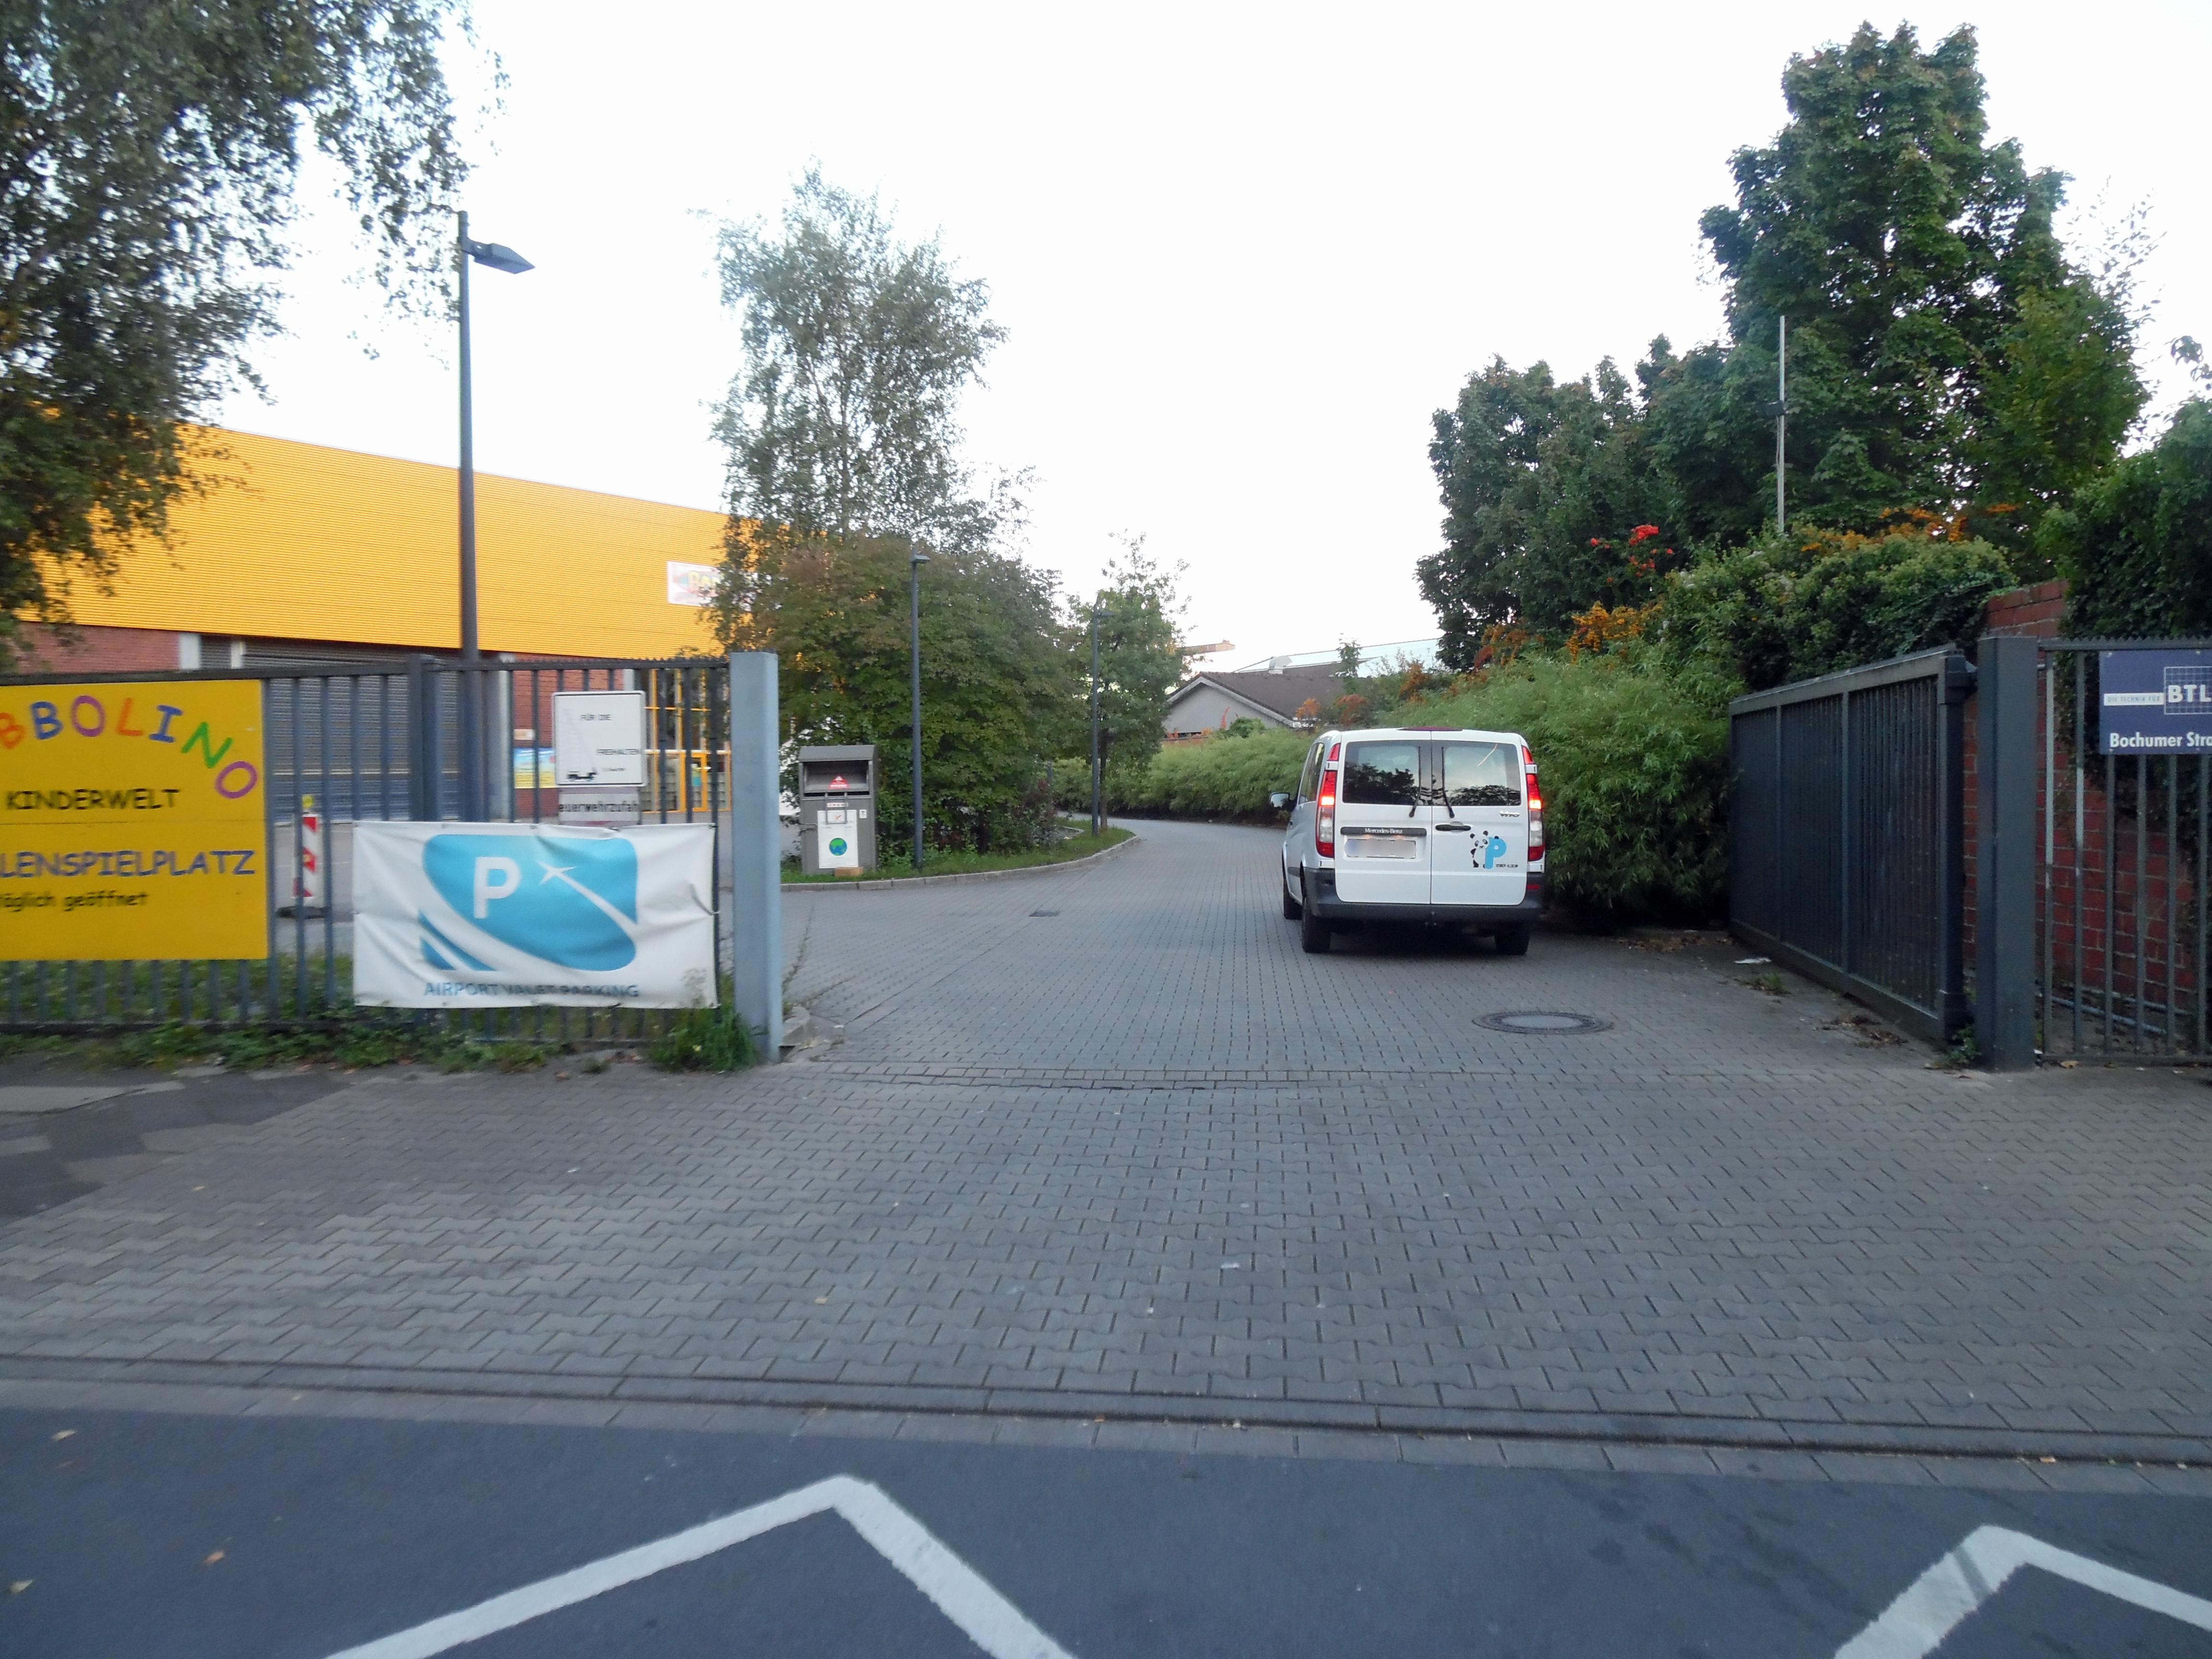 airport valet parking bij d sseldorf via parcompare. Black Bedroom Furniture Sets. Home Design Ideas